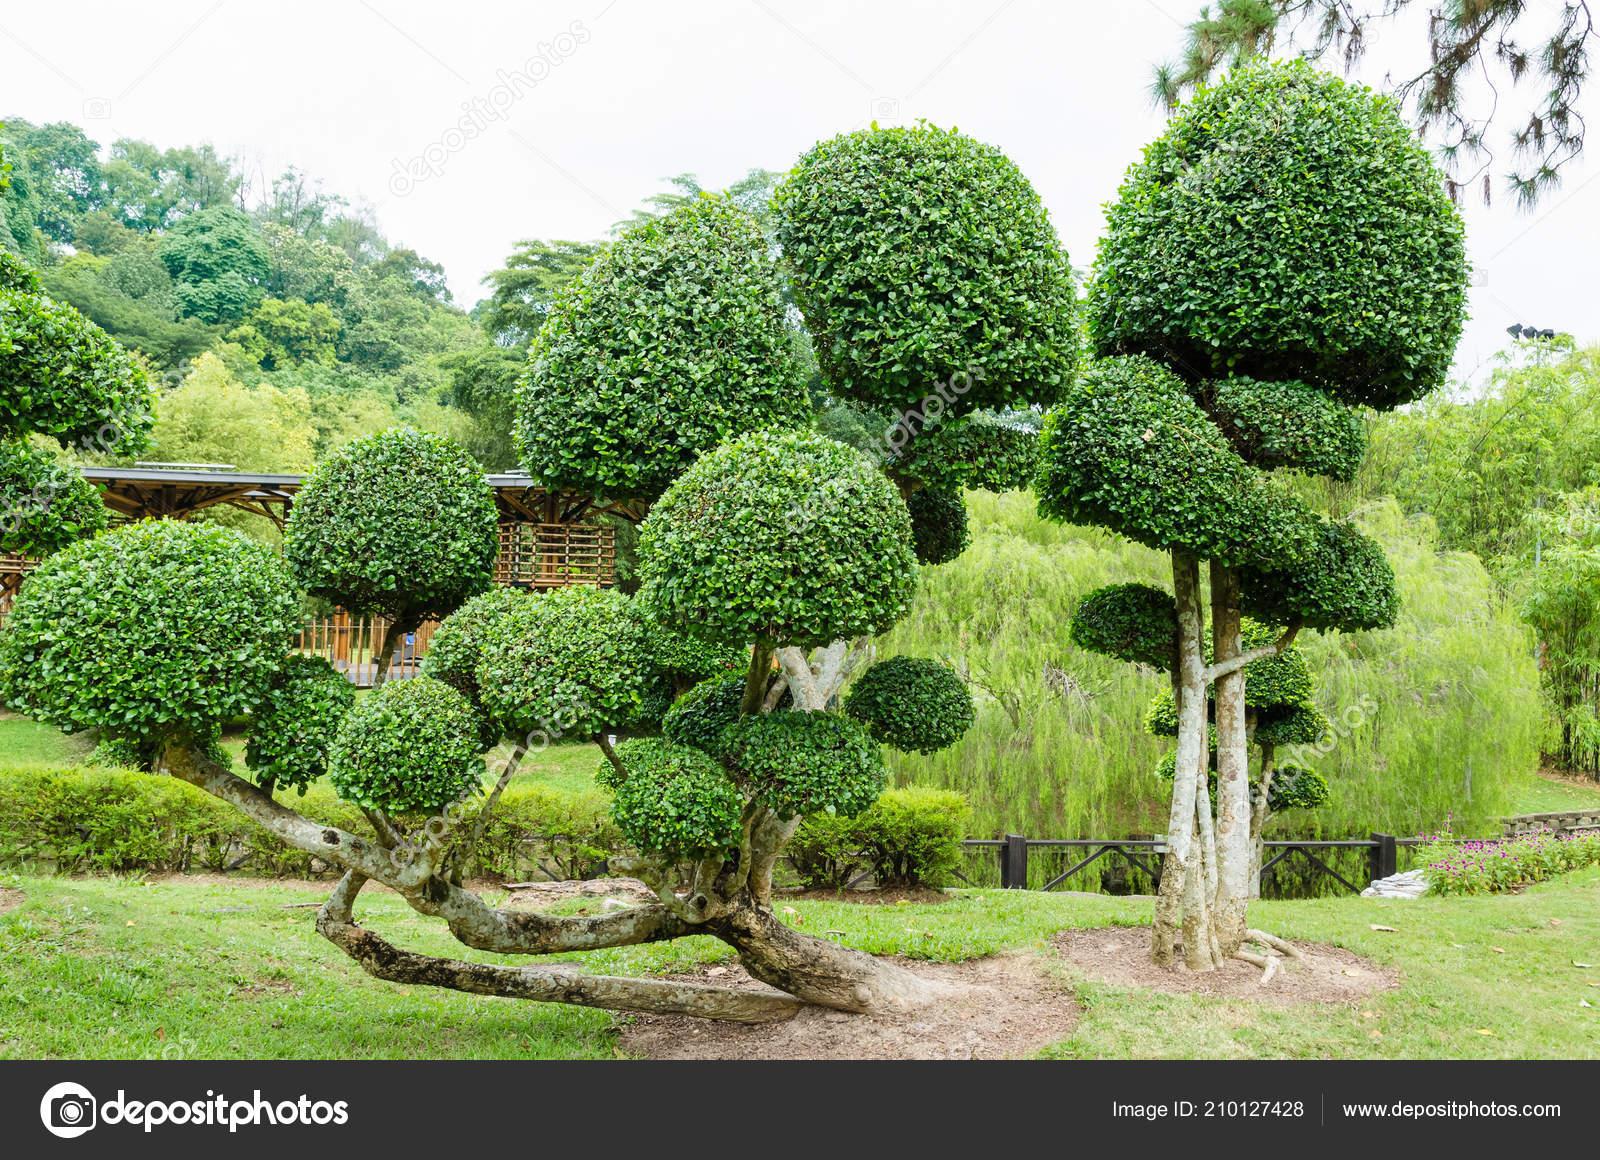 Bomen In Tuin : Streblus asper bomen tuin u2014 stockfoto © gracethang #210127428